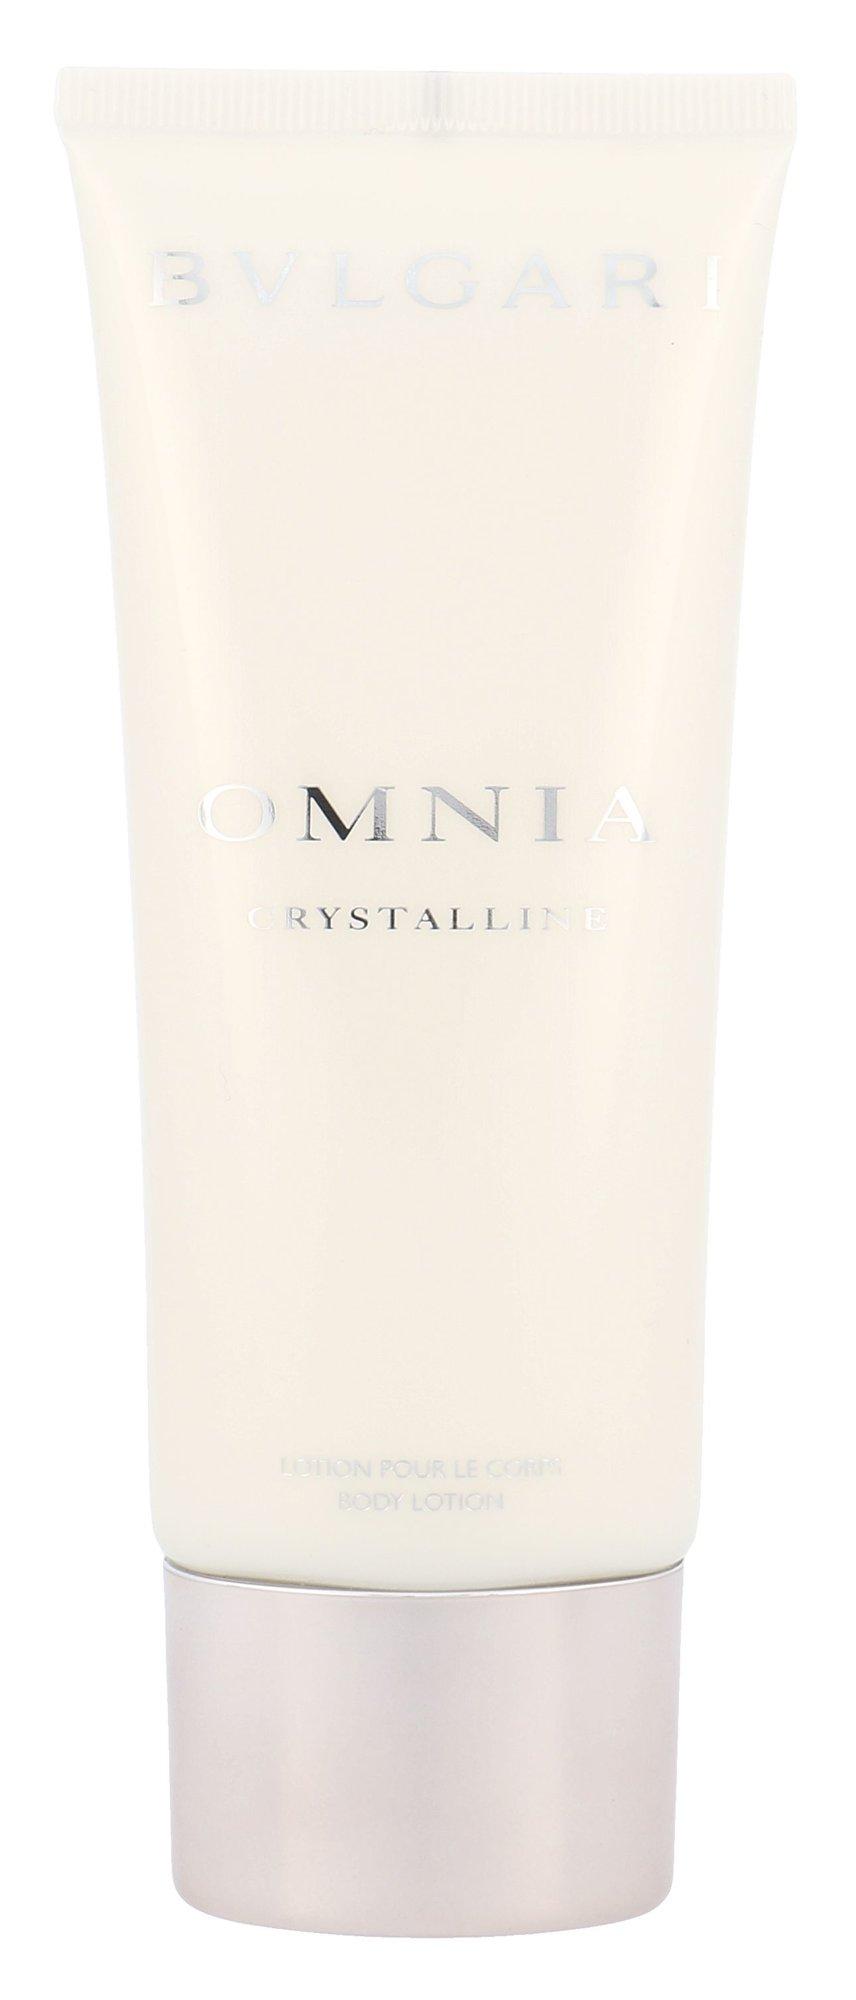 Bvlgari Omnia Crystalline Body lotion 100ml